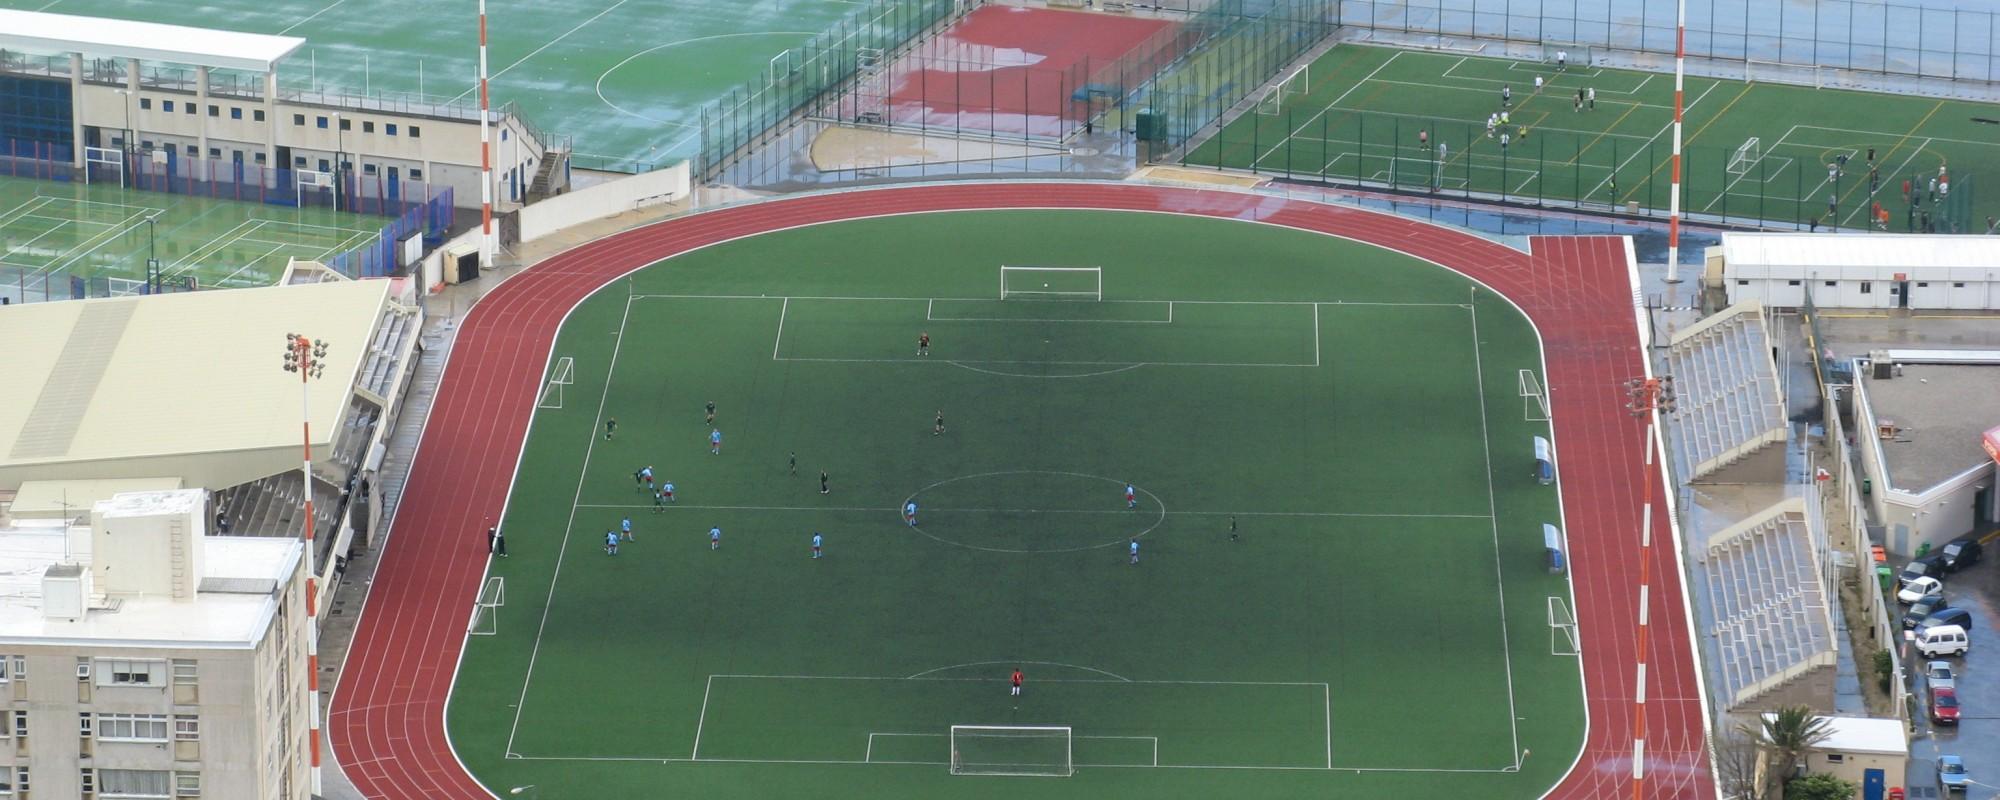 Gfa To Purchase Victoria Stadium To Create New National